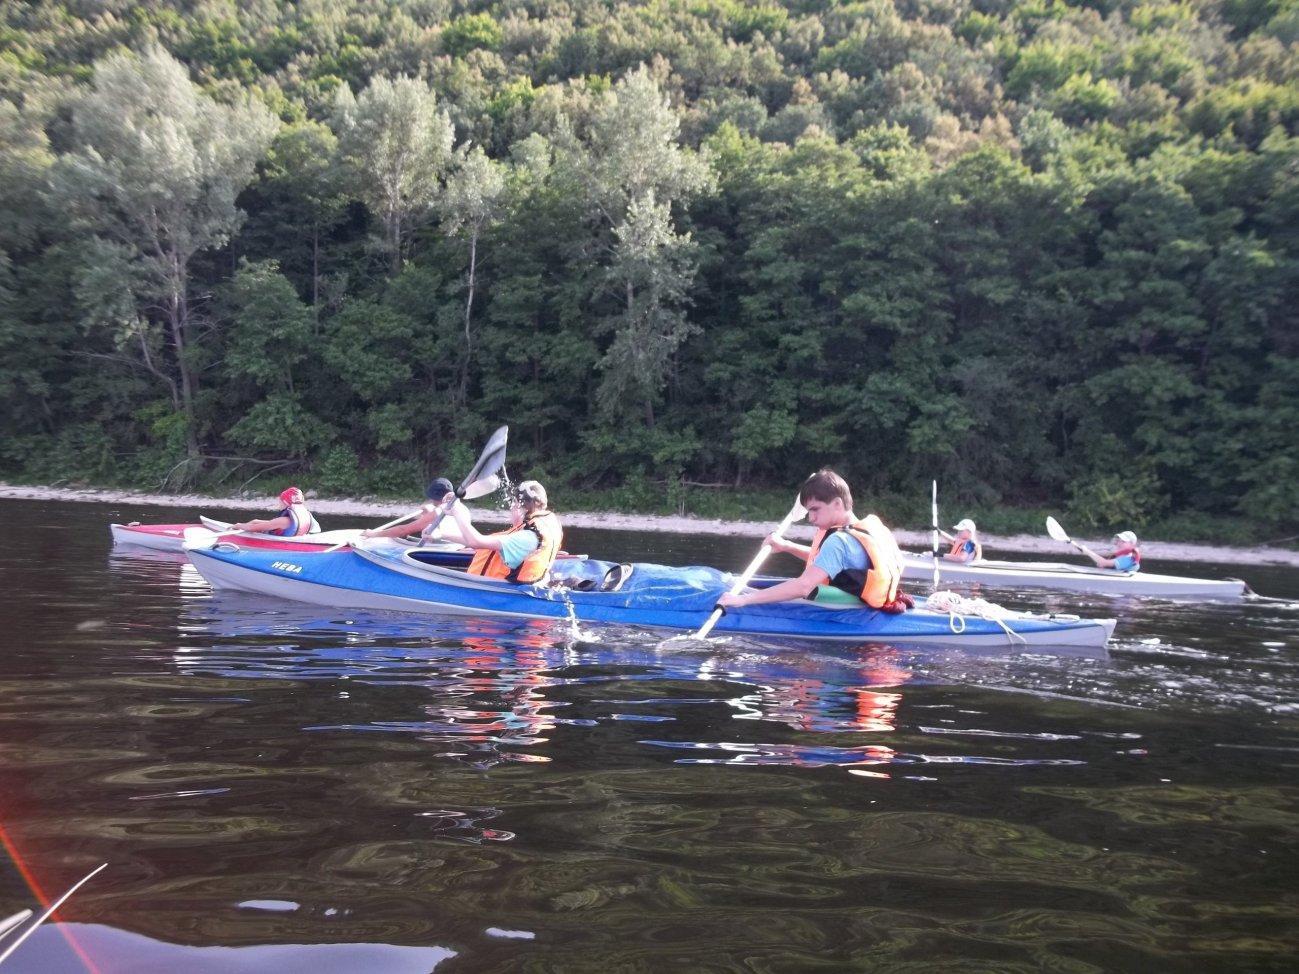 Сплав с друзьями по реке